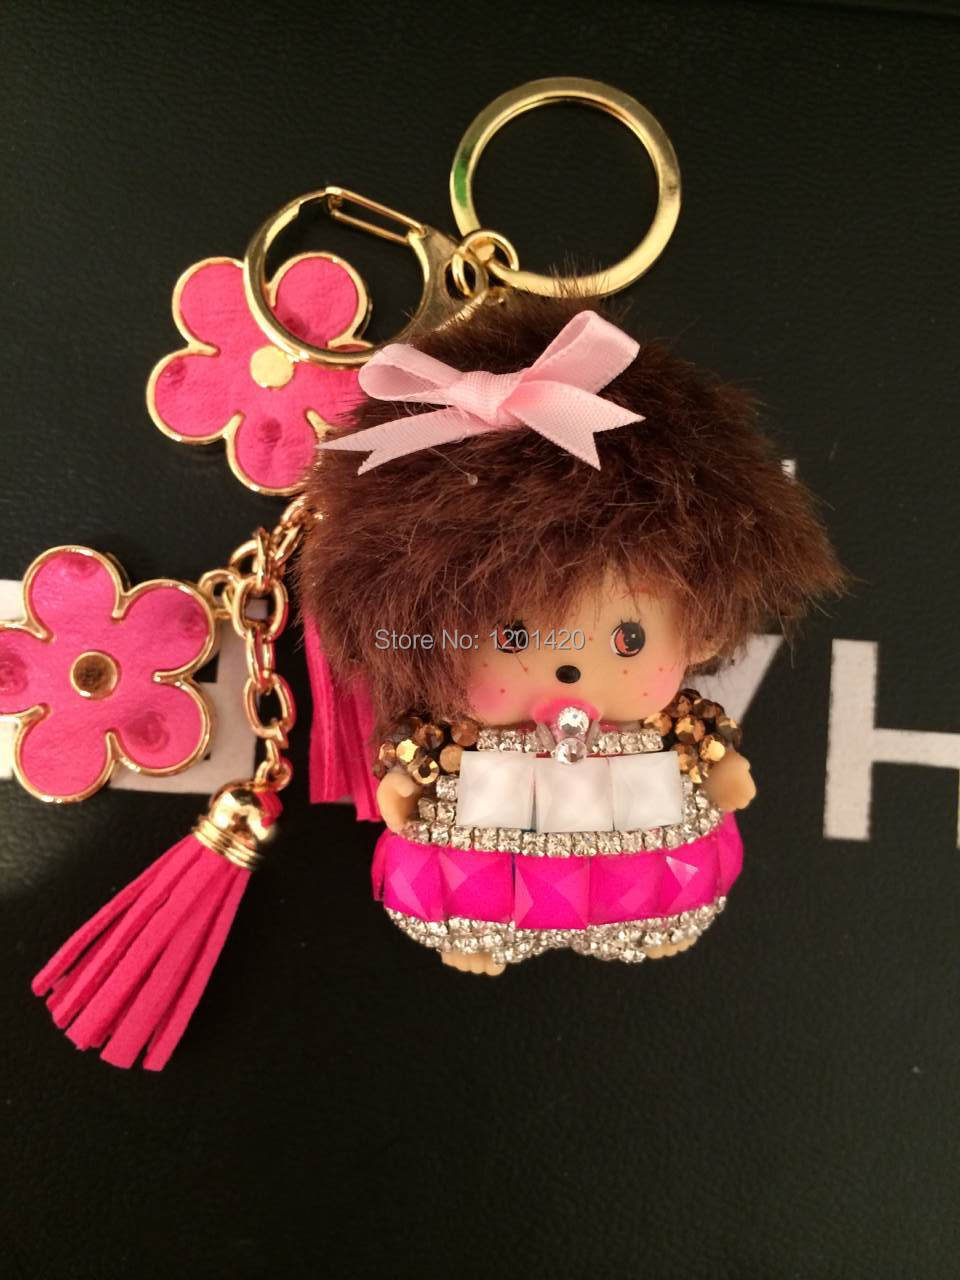 Uncategorized Monchichi Cartoon cartoon keychain monchichi promotion shop for promotional bling doll bag charms pink rhinestone monchhichi key chains flower bow ring tassel handmade keychains